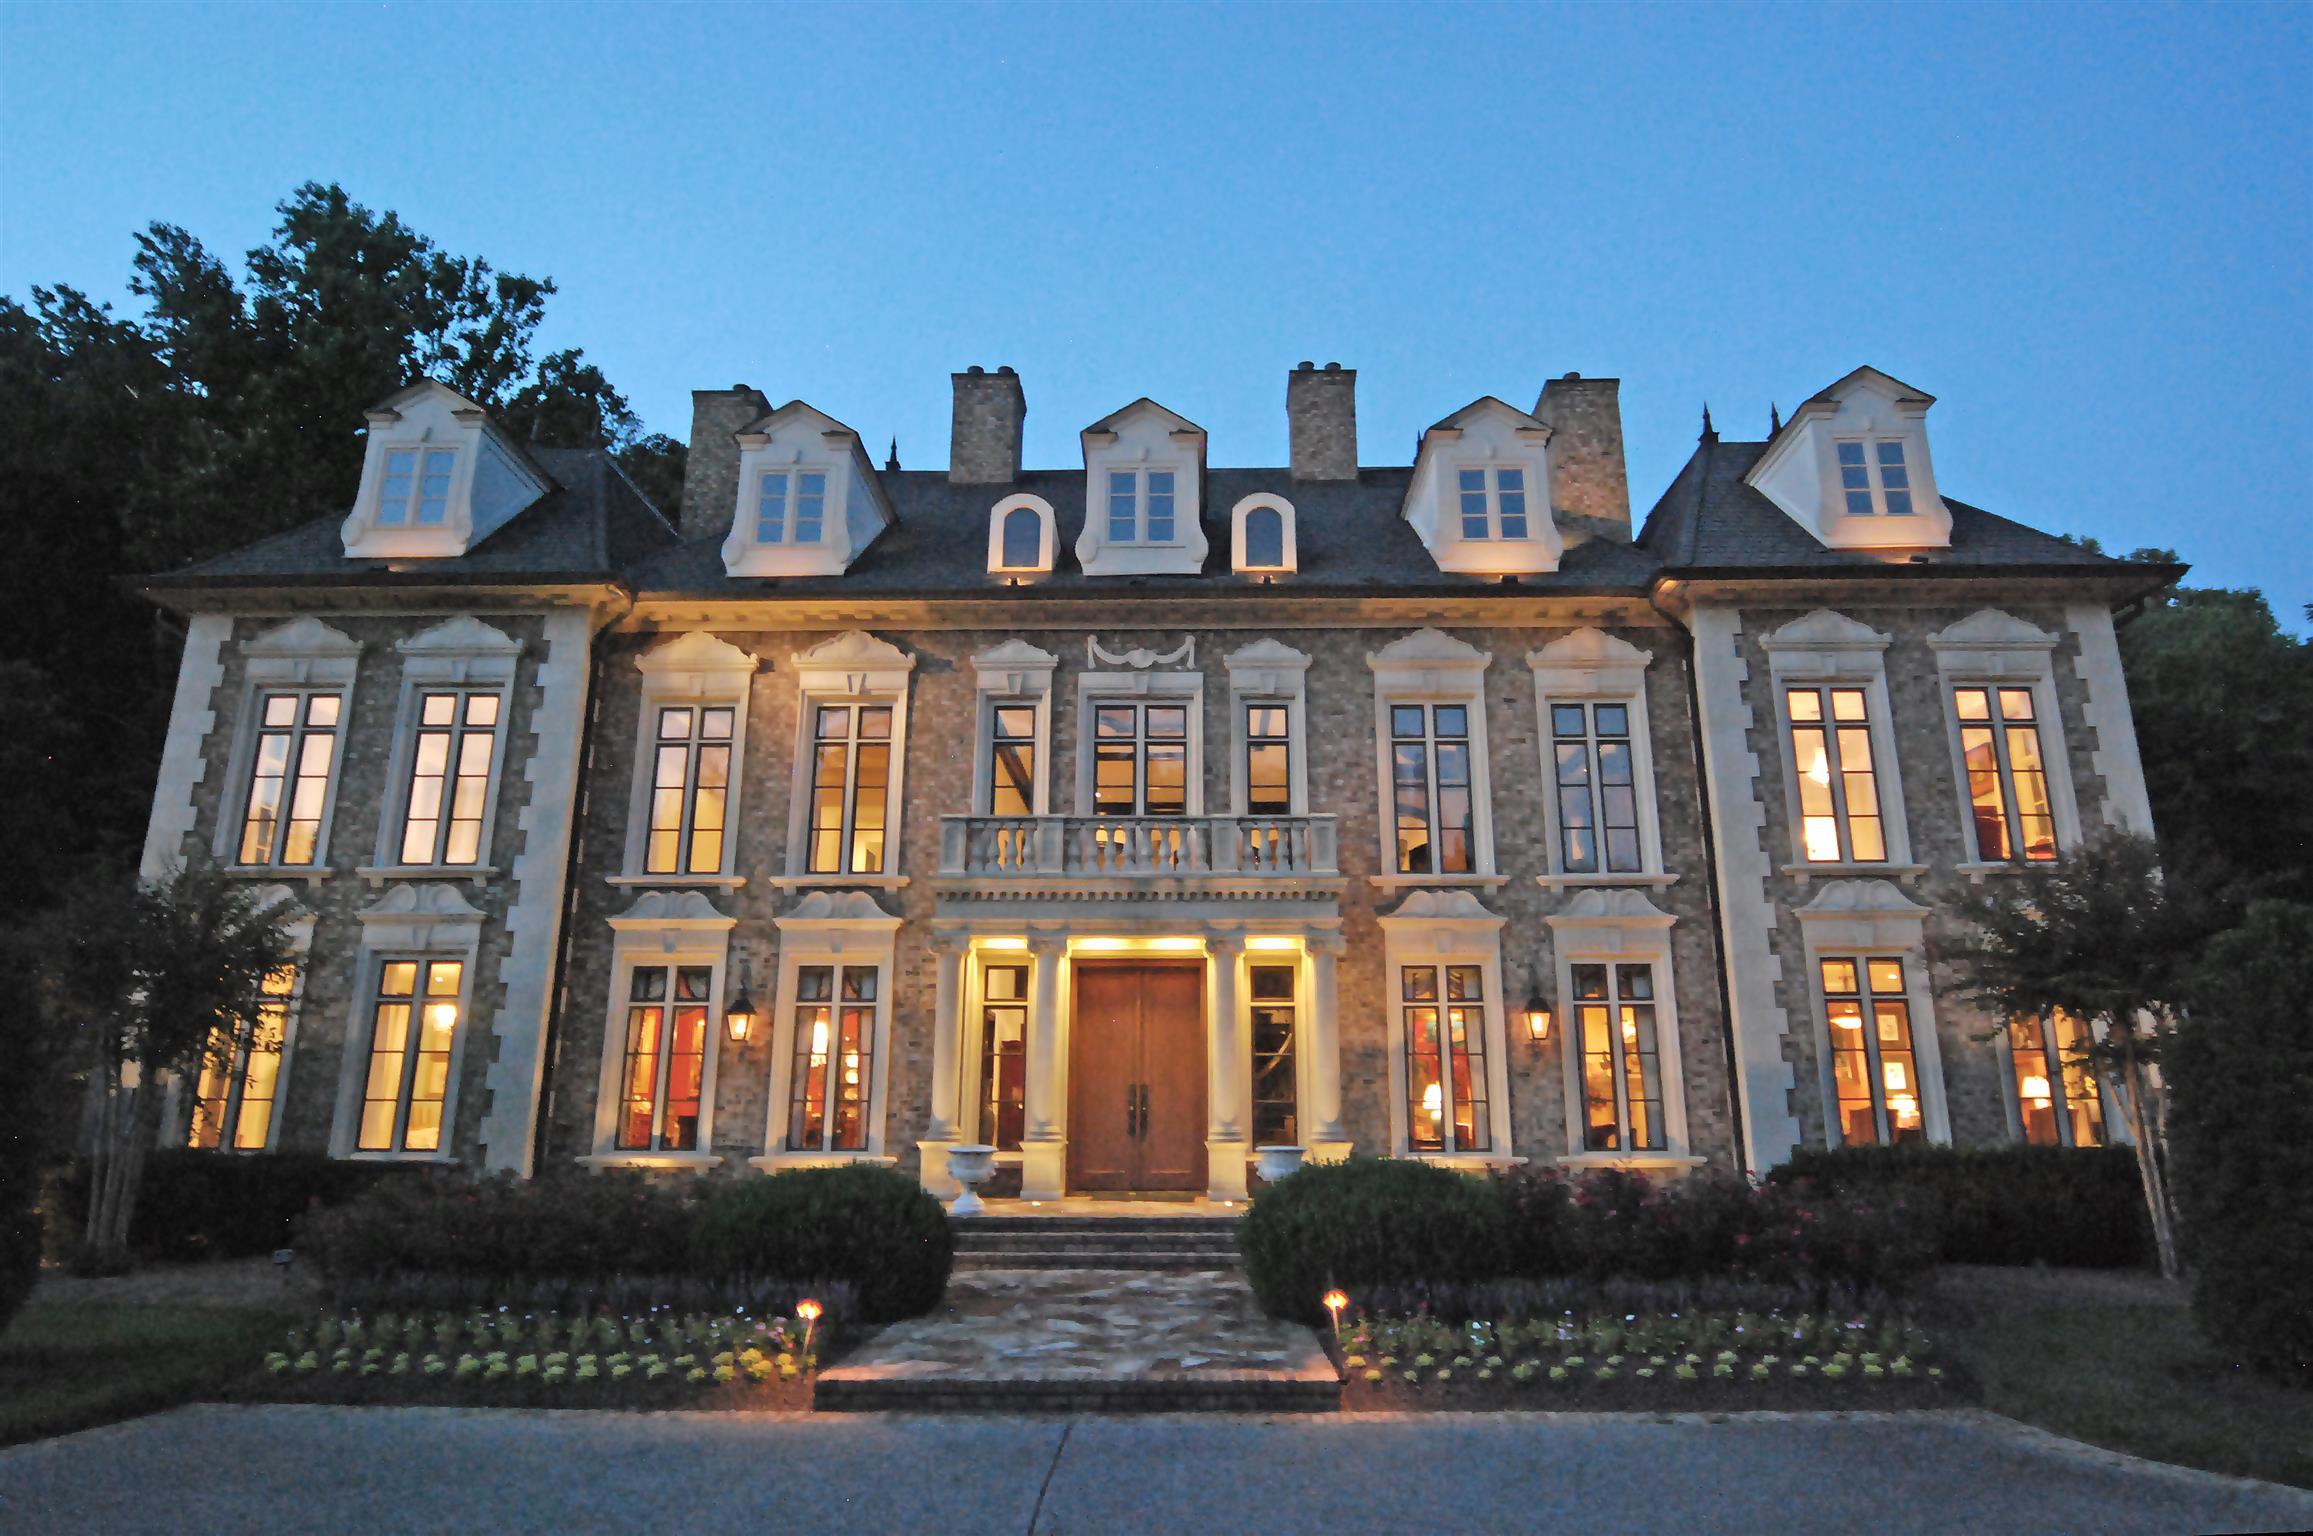 1044 Vaughn Crest Dr, Franklin, TN 37069 - Franklin, TN real estate listing